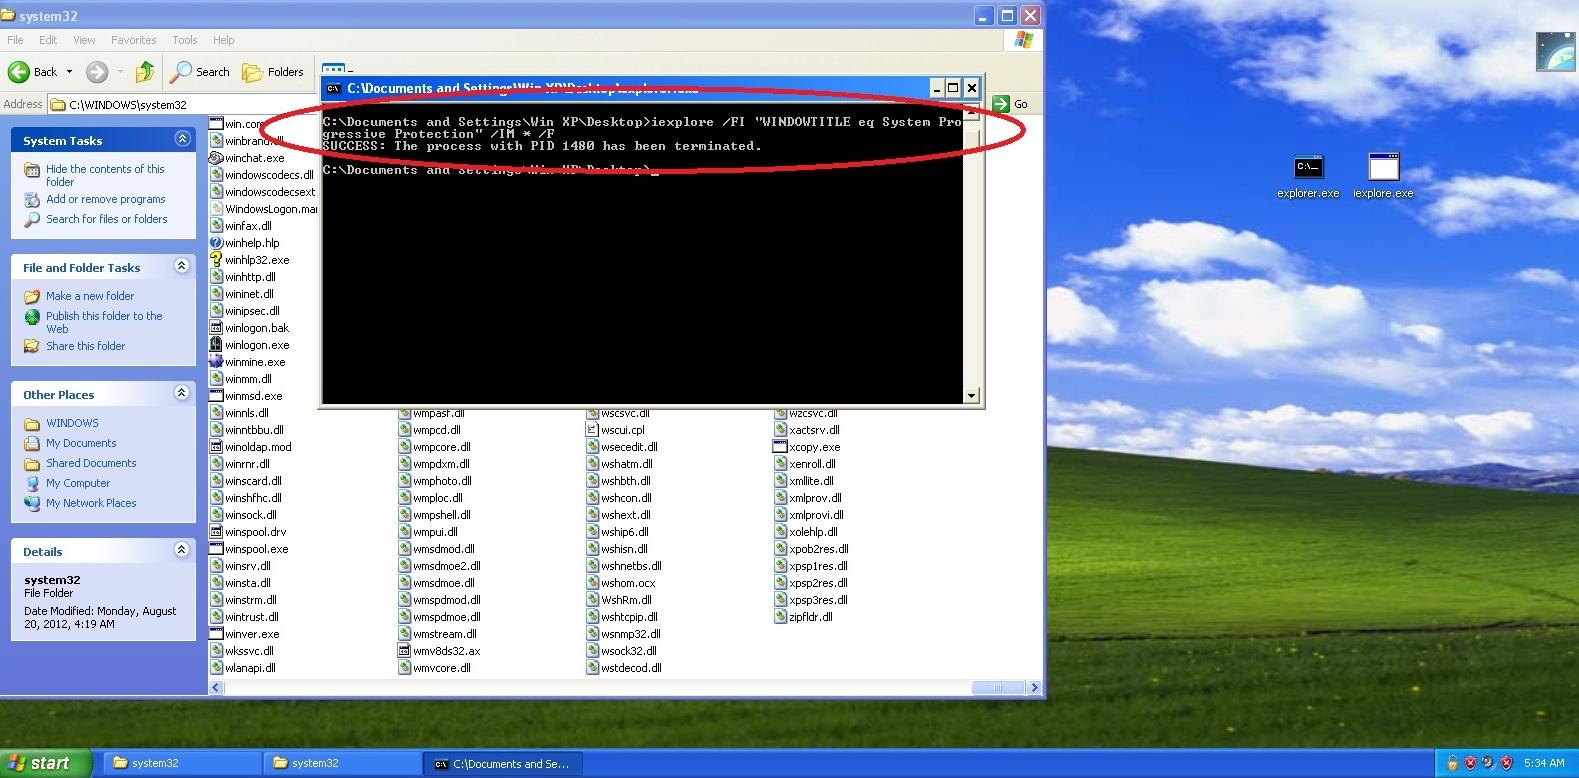 "iexplore /FI ""WINDOWTITLE eq System Progressive Protection"" /IM * /F"